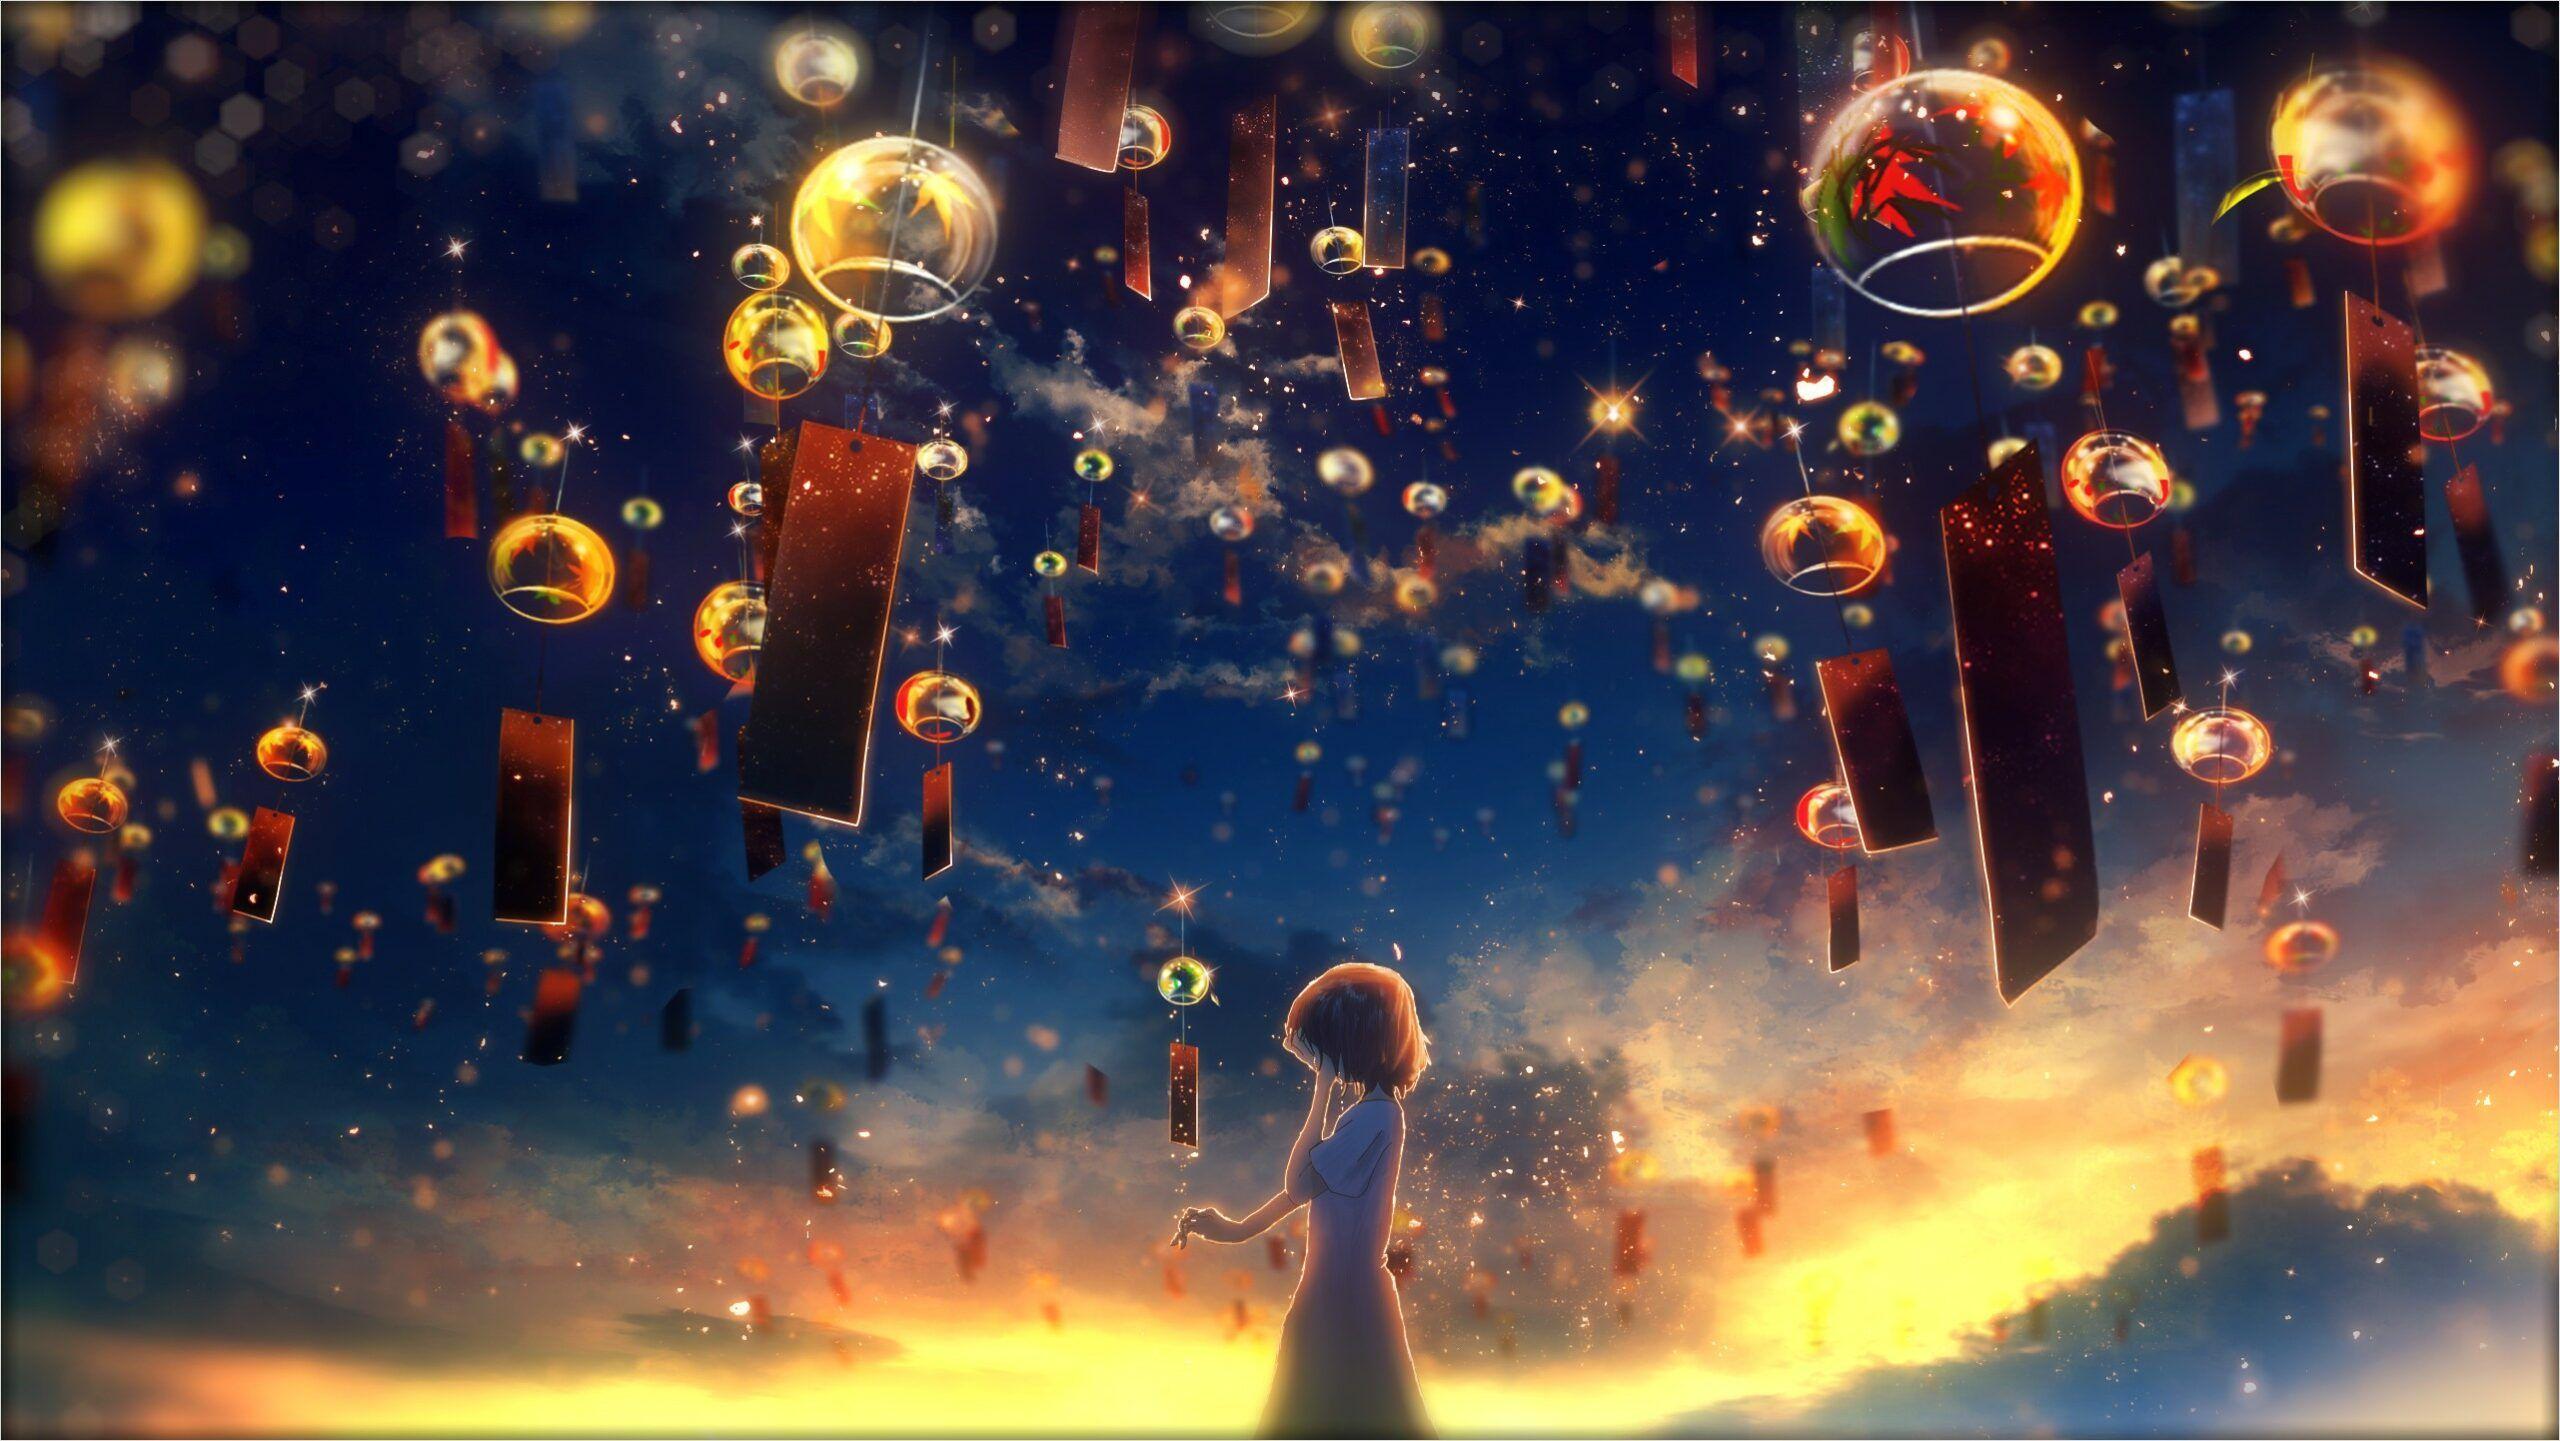 4k Animated Wallpaper Dream Hd Anime Wallpapers Sky Anime Anime Scenery Wallpaper